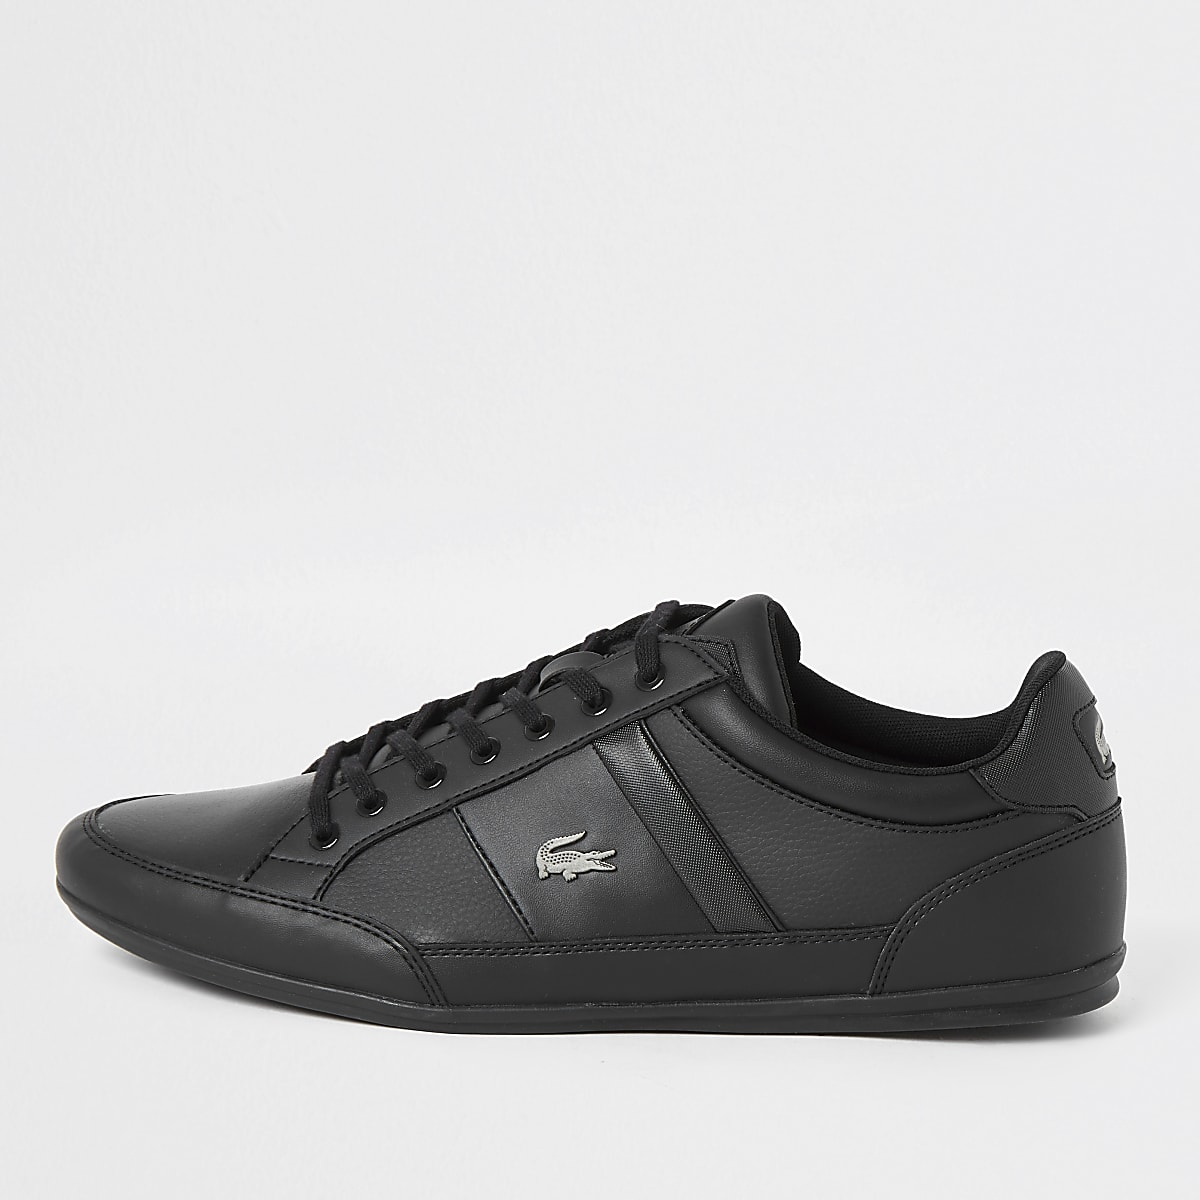 Lacoste black Chayman trainers